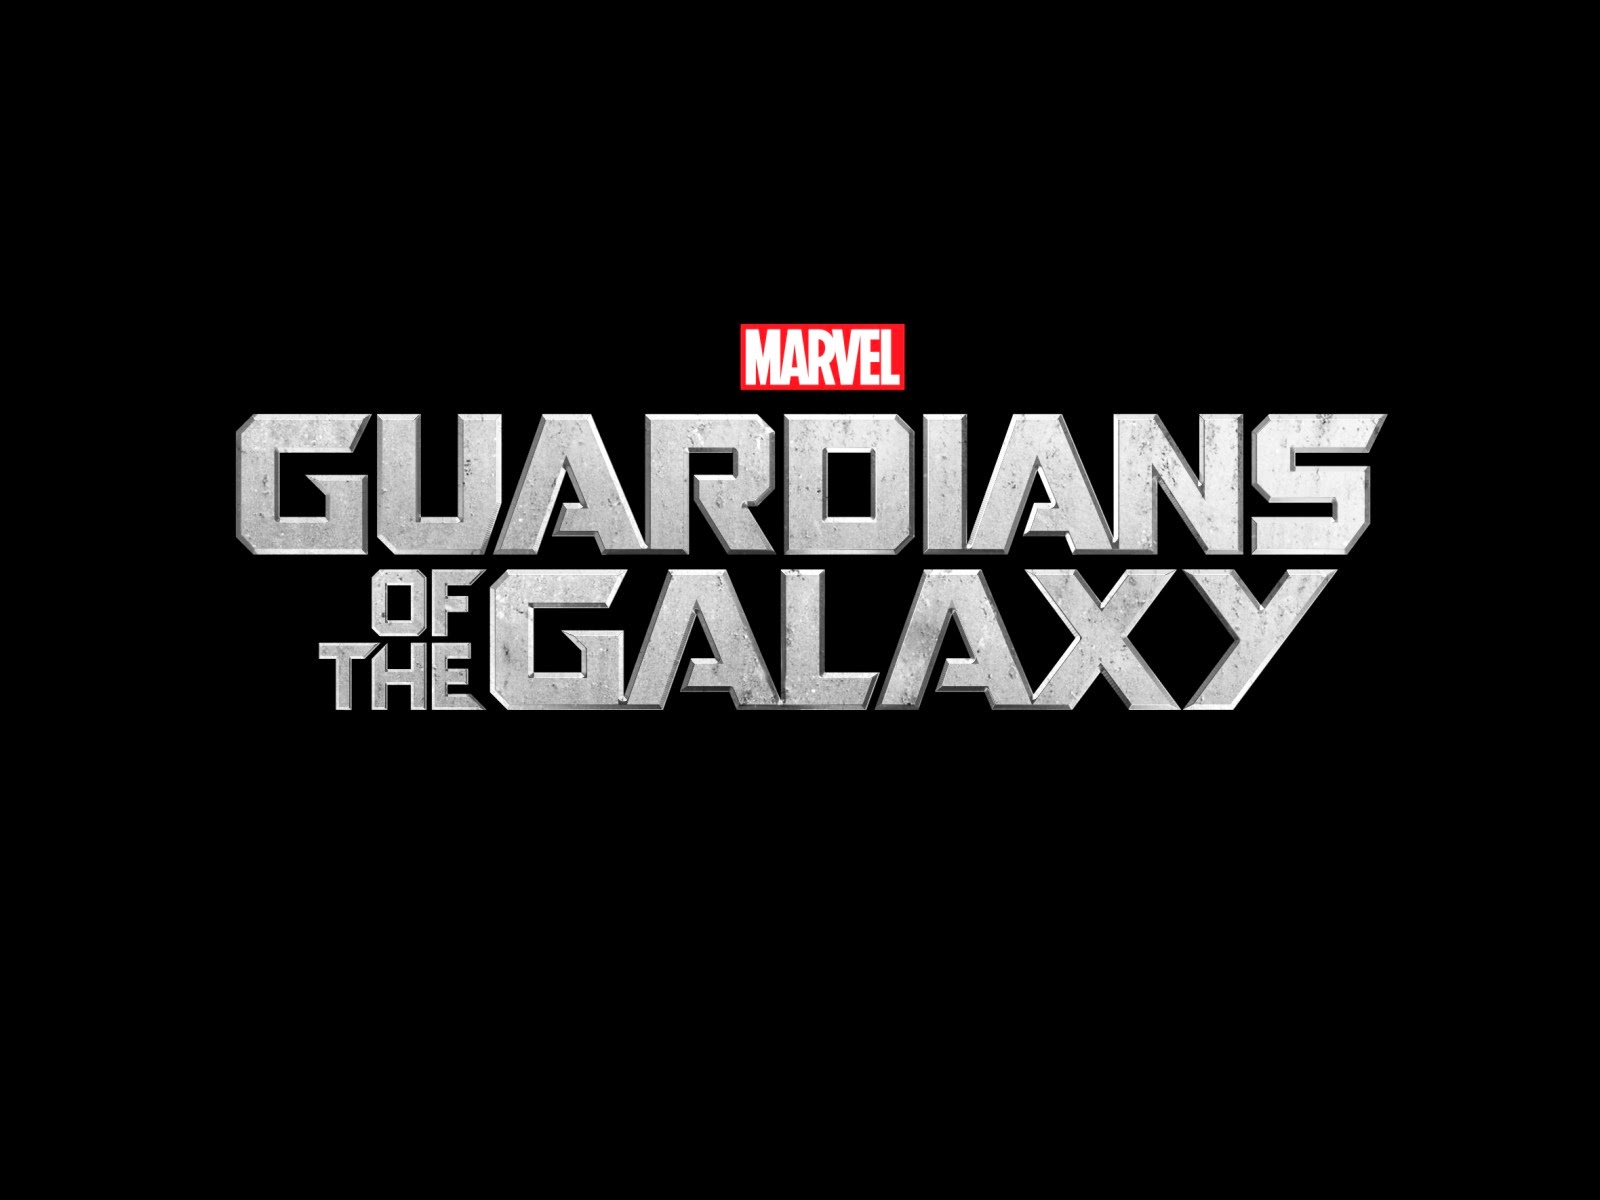 Guardians Of The Galaxy Superhero Team Logo HD Desktop Wallpaper